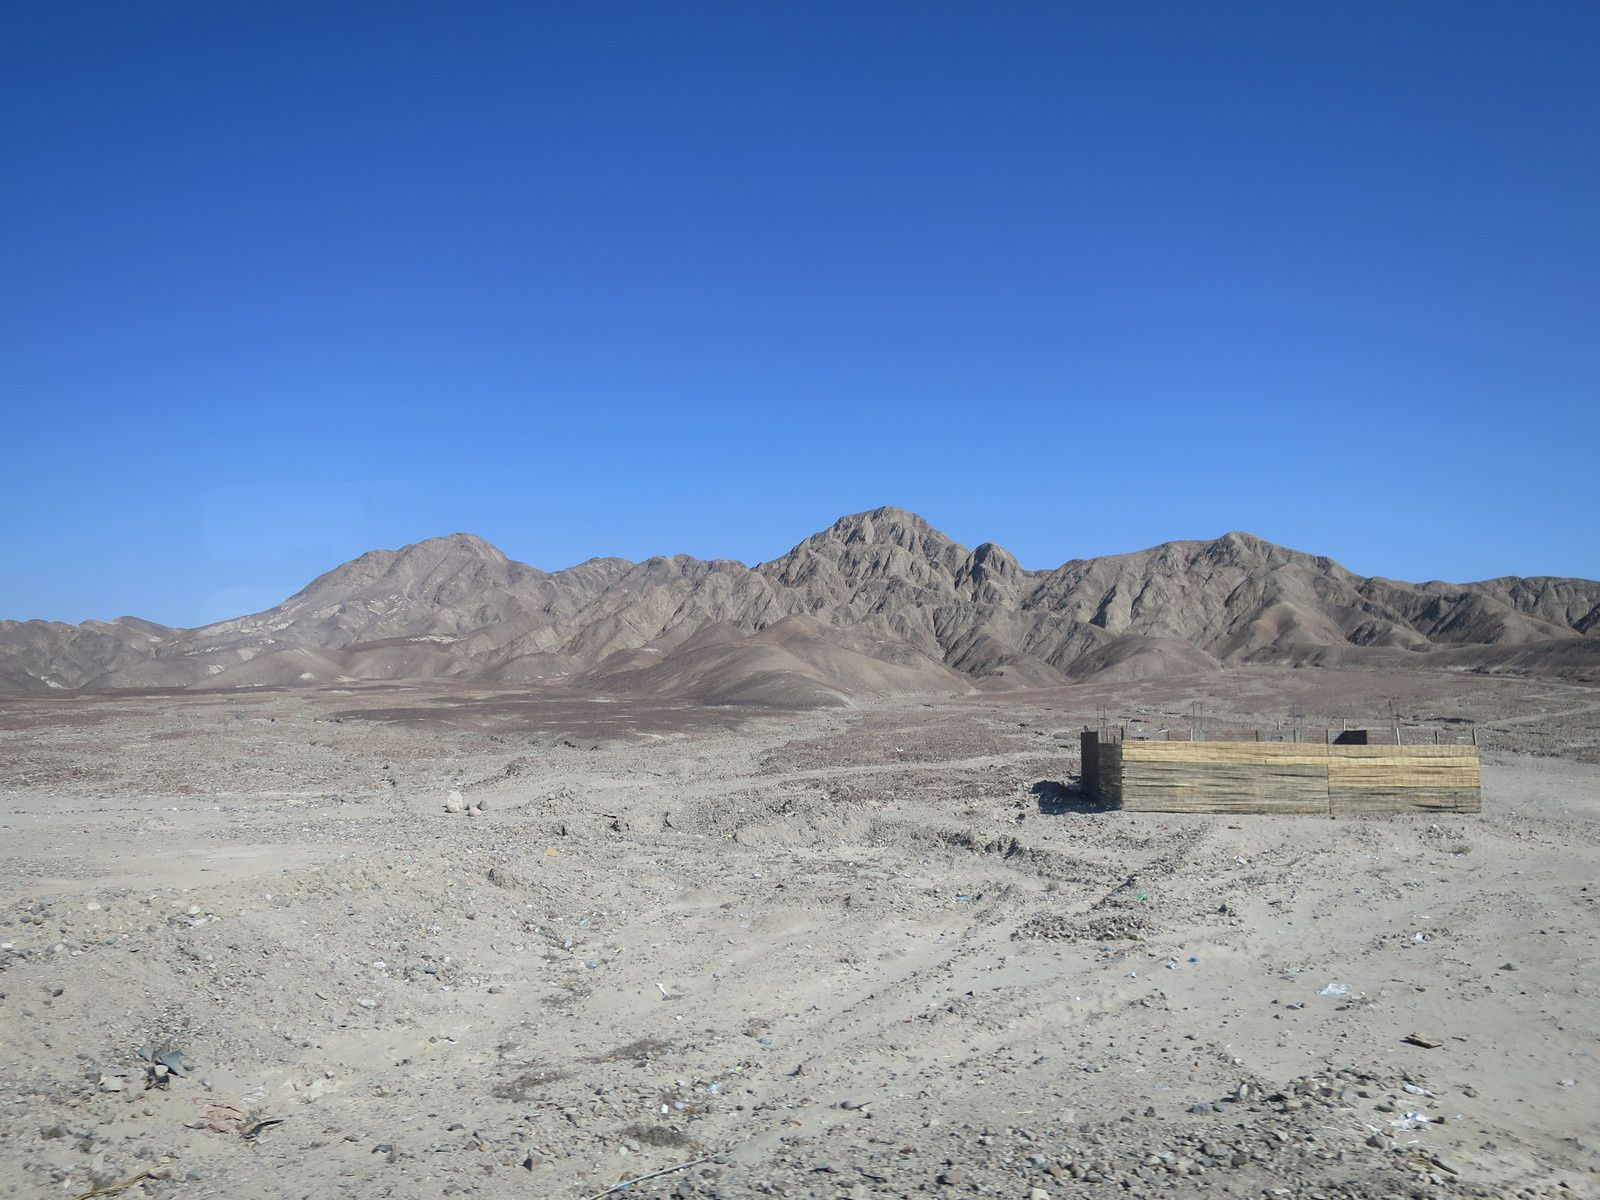 Entre Ica et Nazca. Ph. Delahaye.